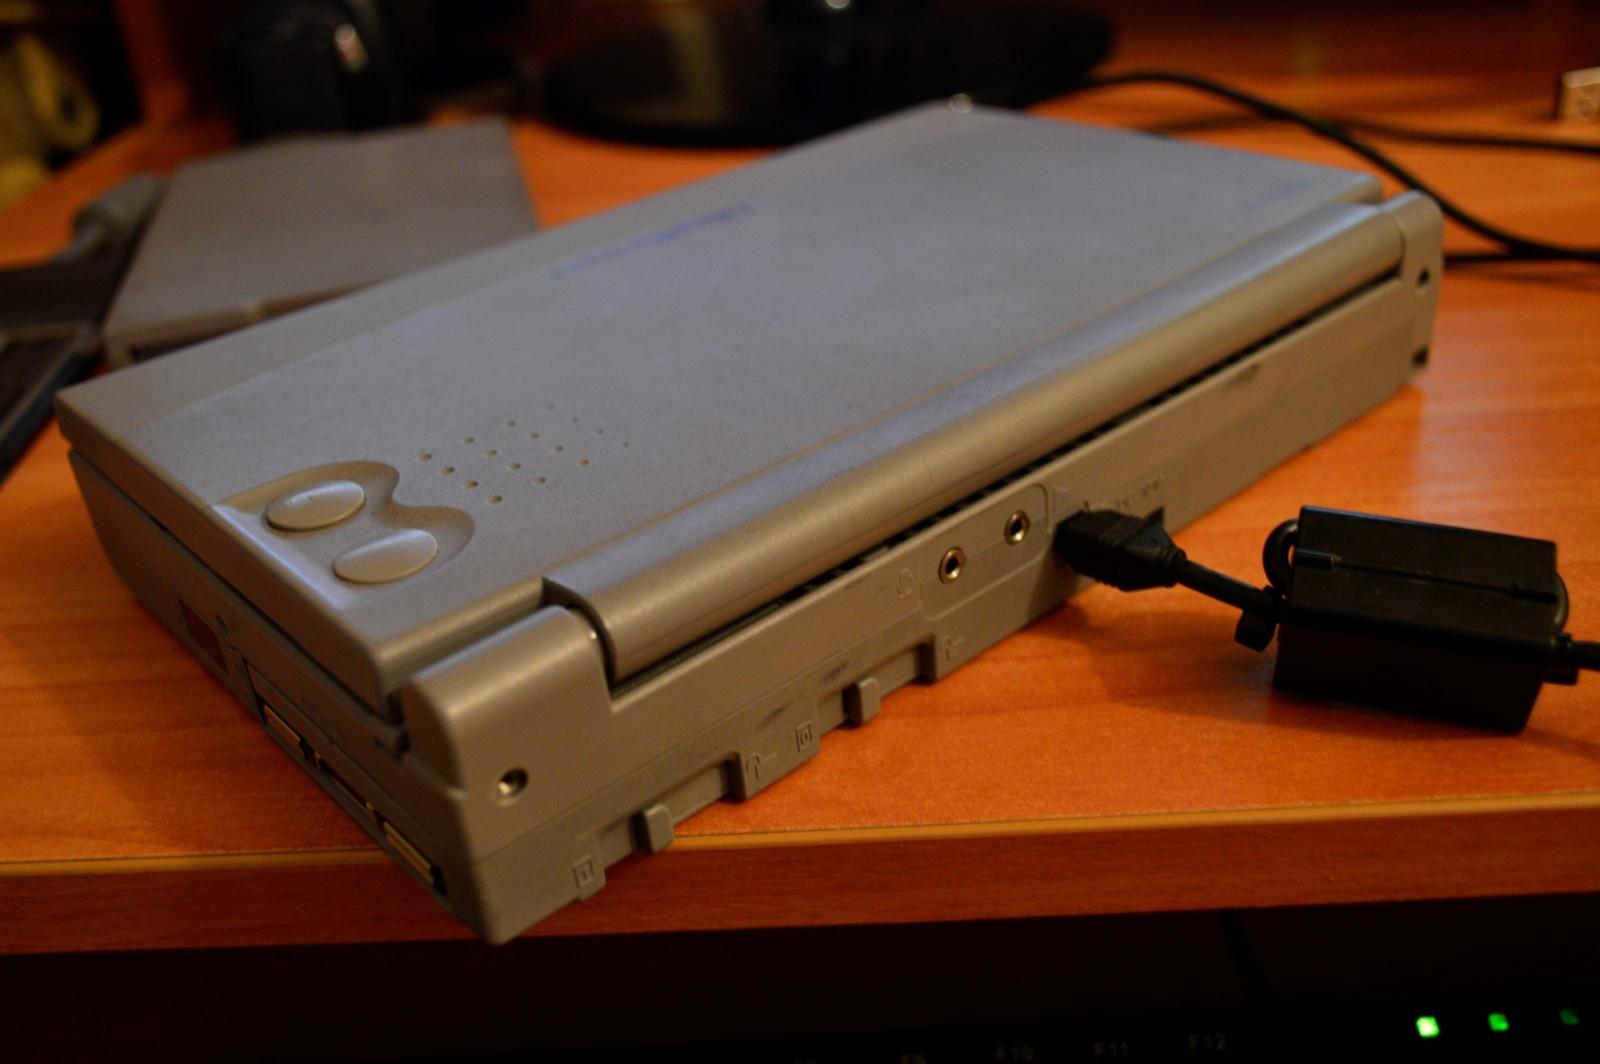 Какими были ноутбуки 20 лет назад на примере Toshiba libretto 100ct - 8